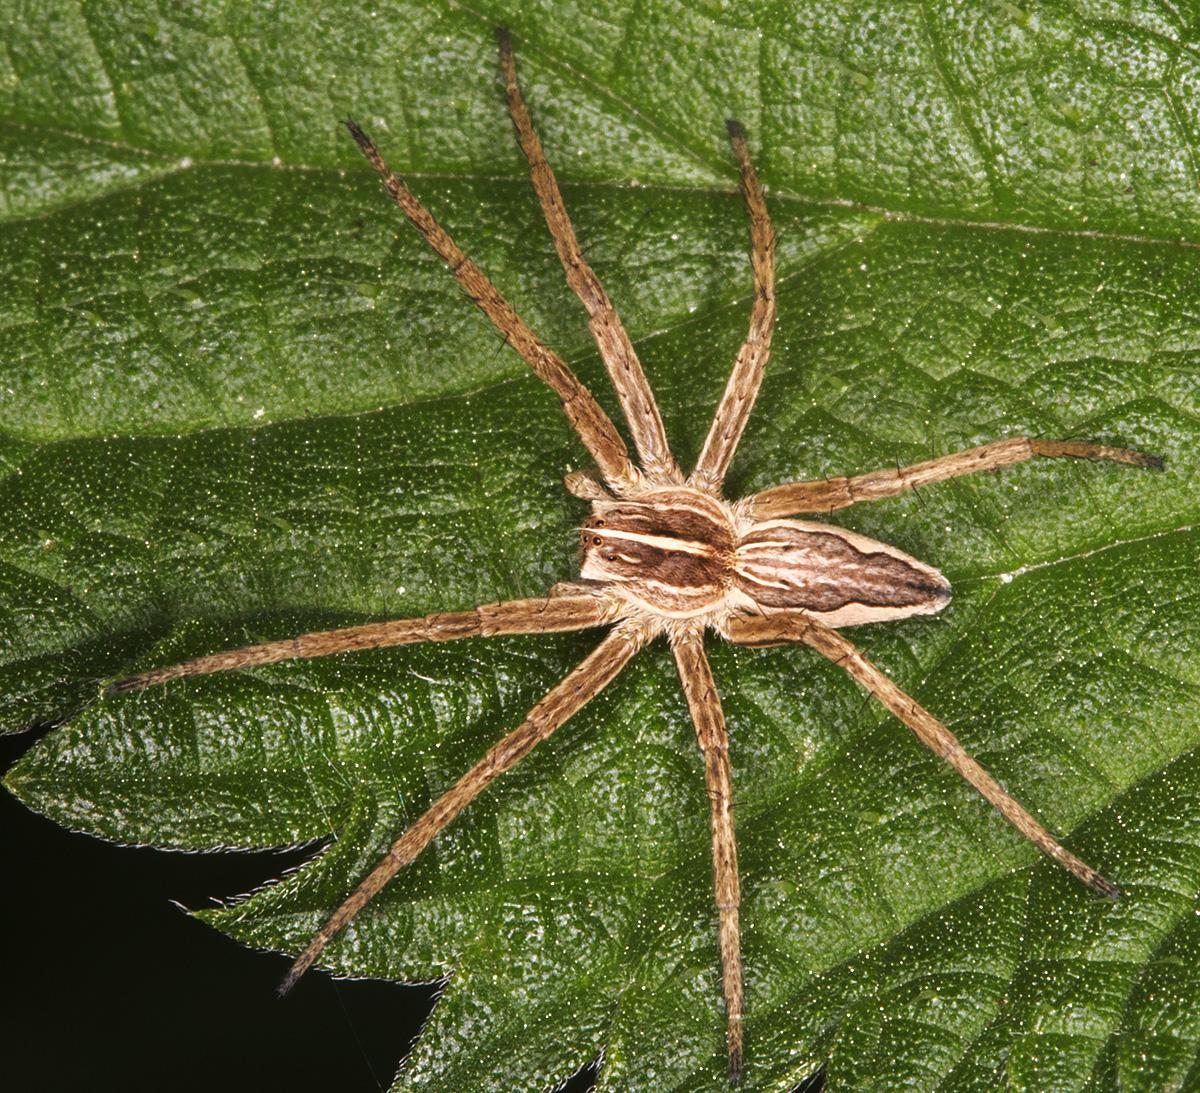 Nursery Web Spider, Pisaura mirabilis.  Gates Green Road, Coney Hall, 21 September 2014.